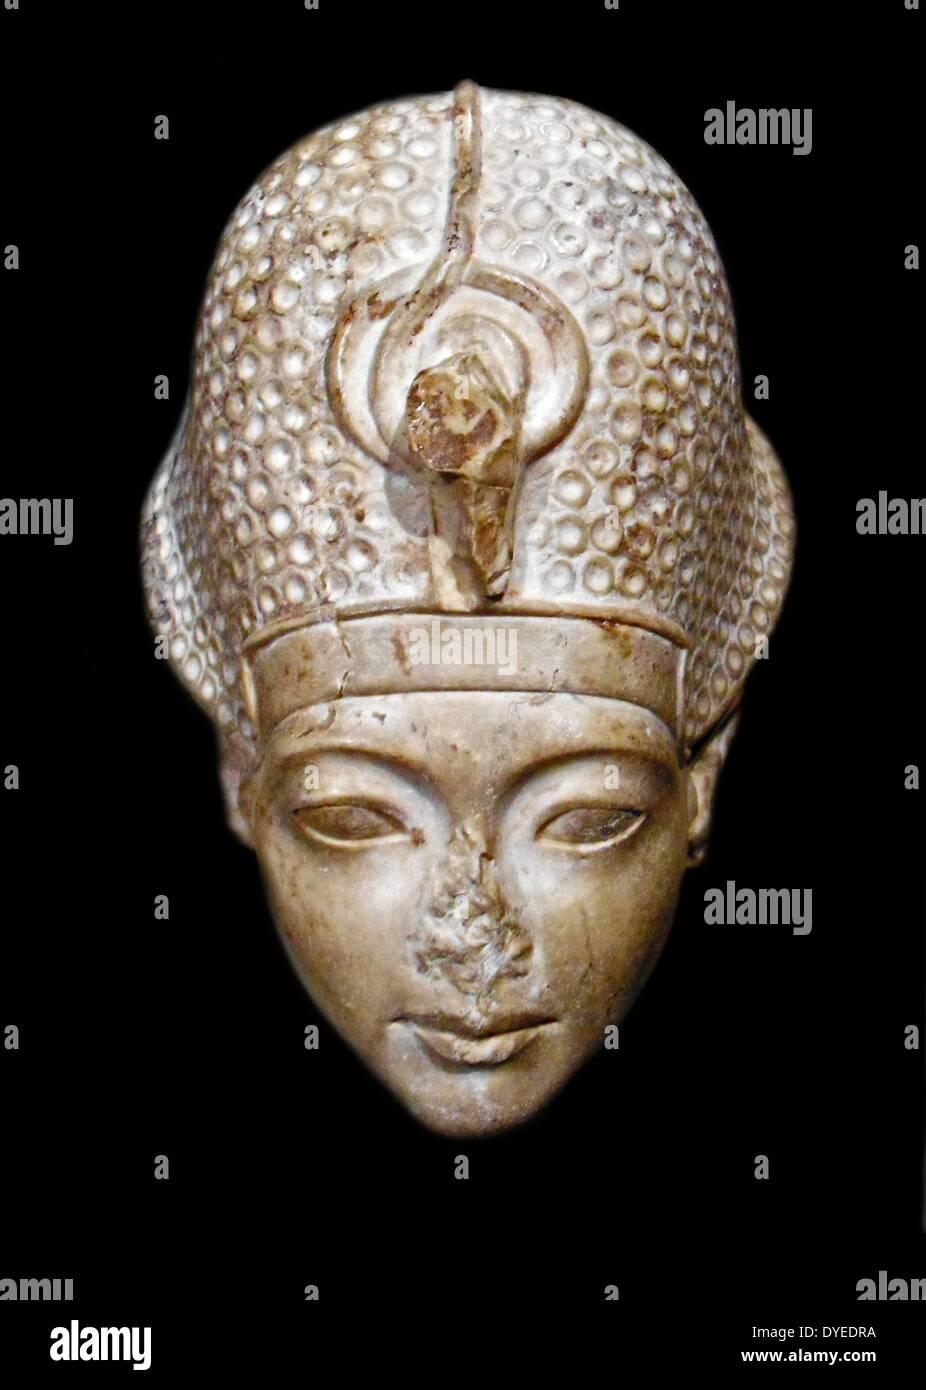 Head of King Tutankhamun 1336 B.C. - Stock Image